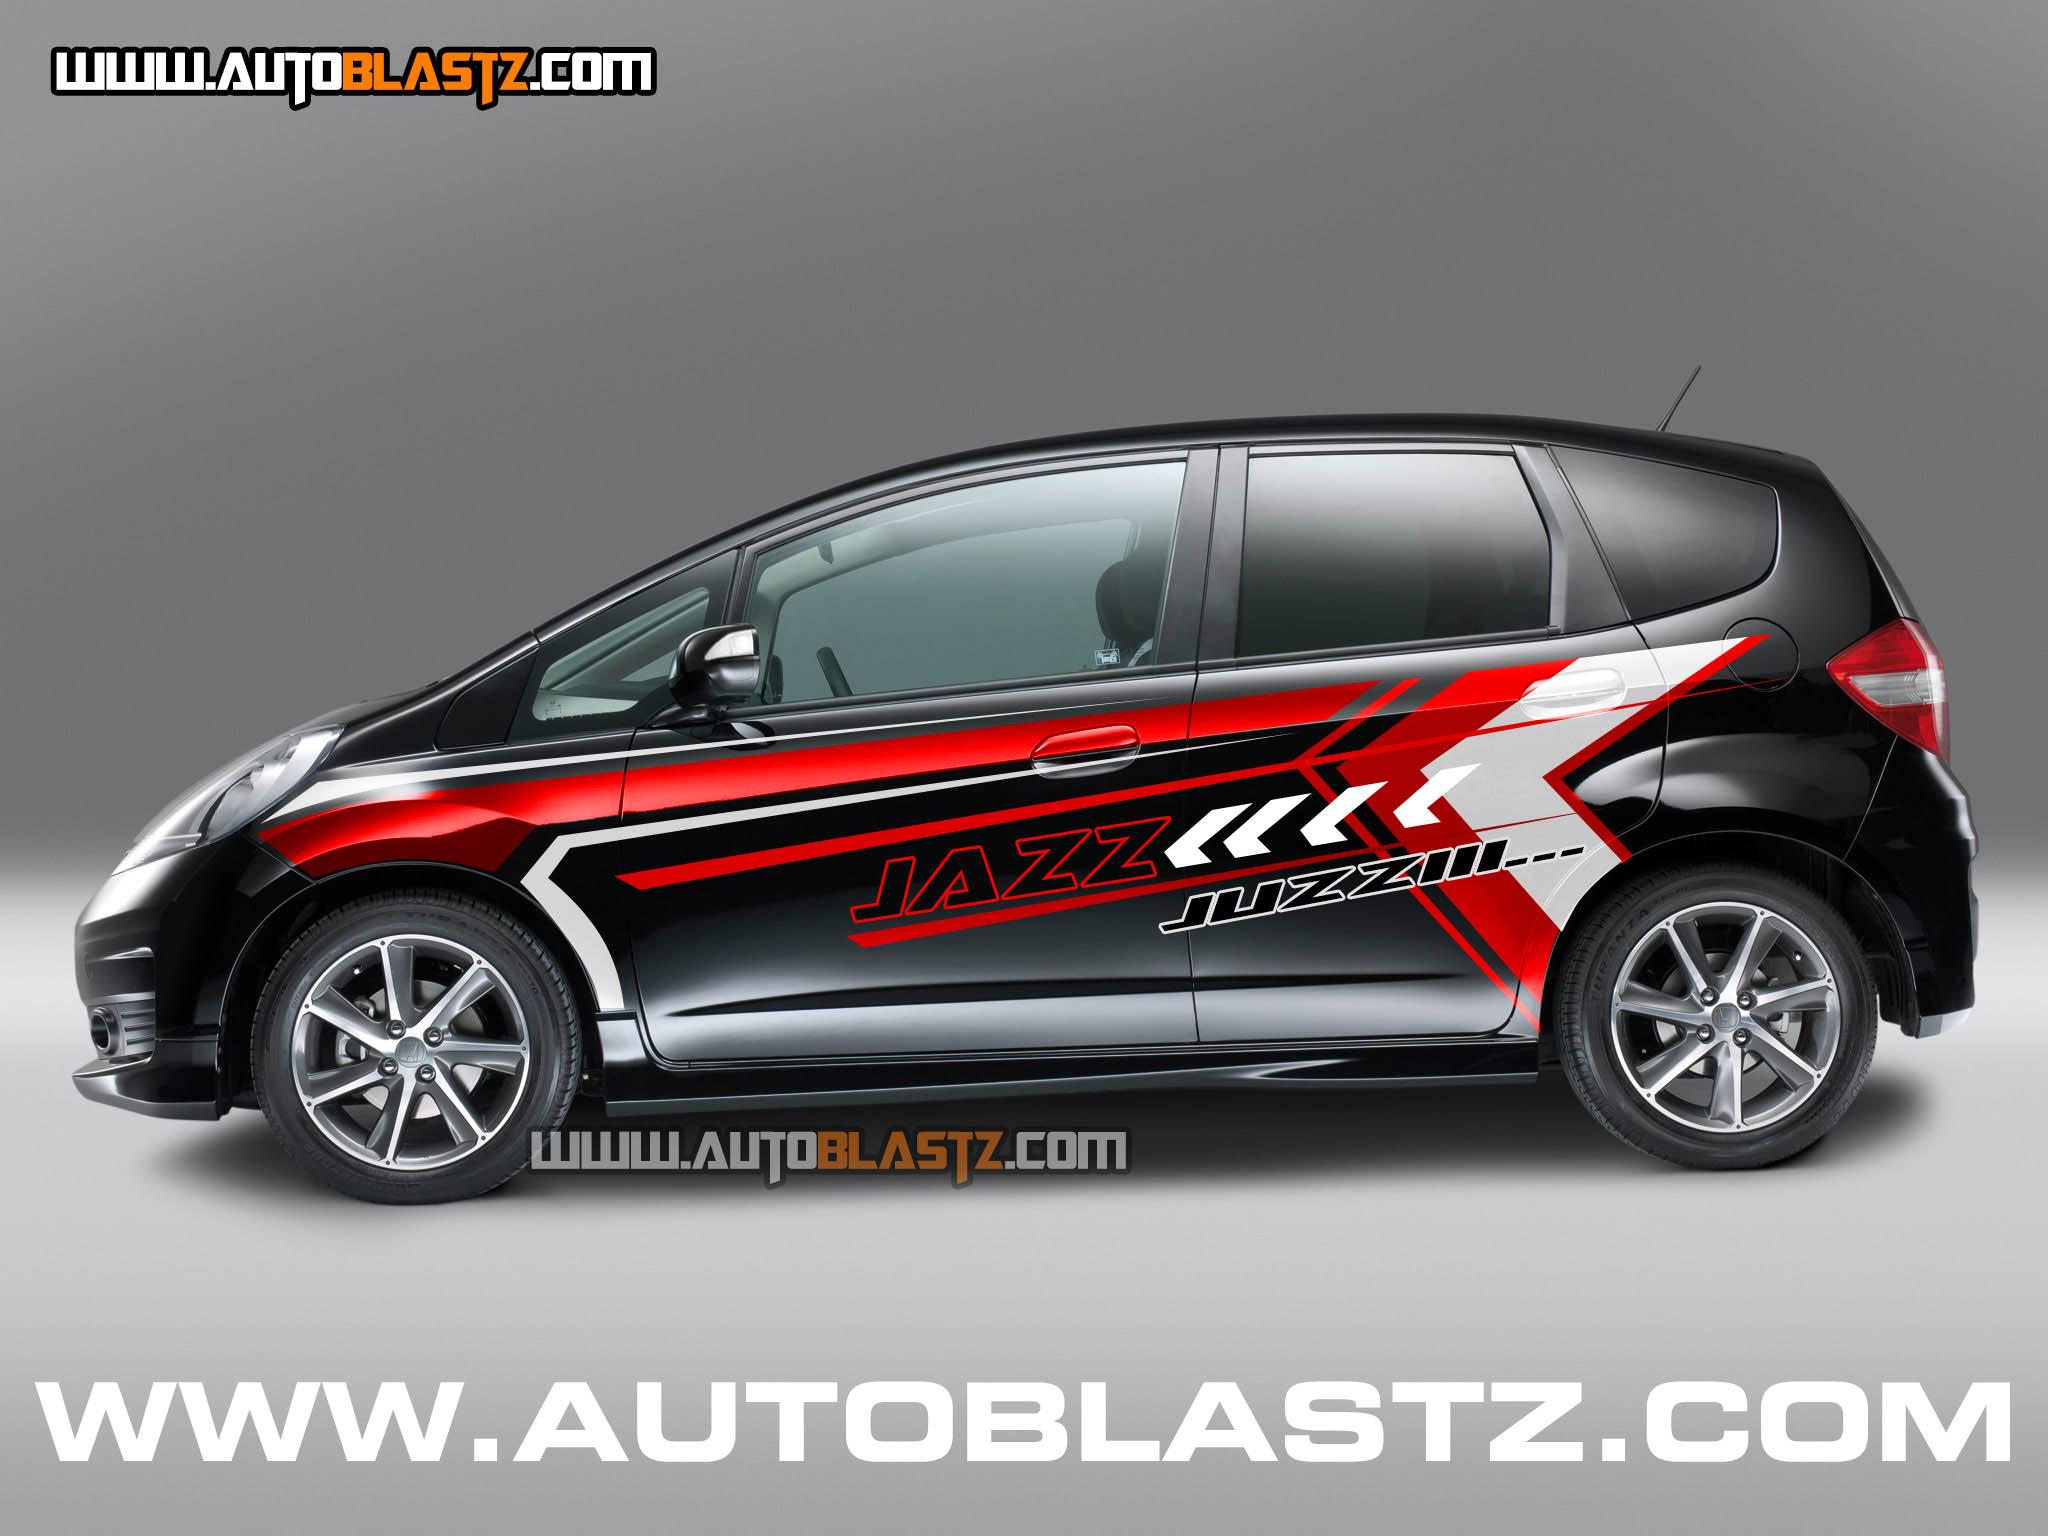 CAR SERIES Modifikasi Honda Jazz Black Stiker Desain Sporty Jazz